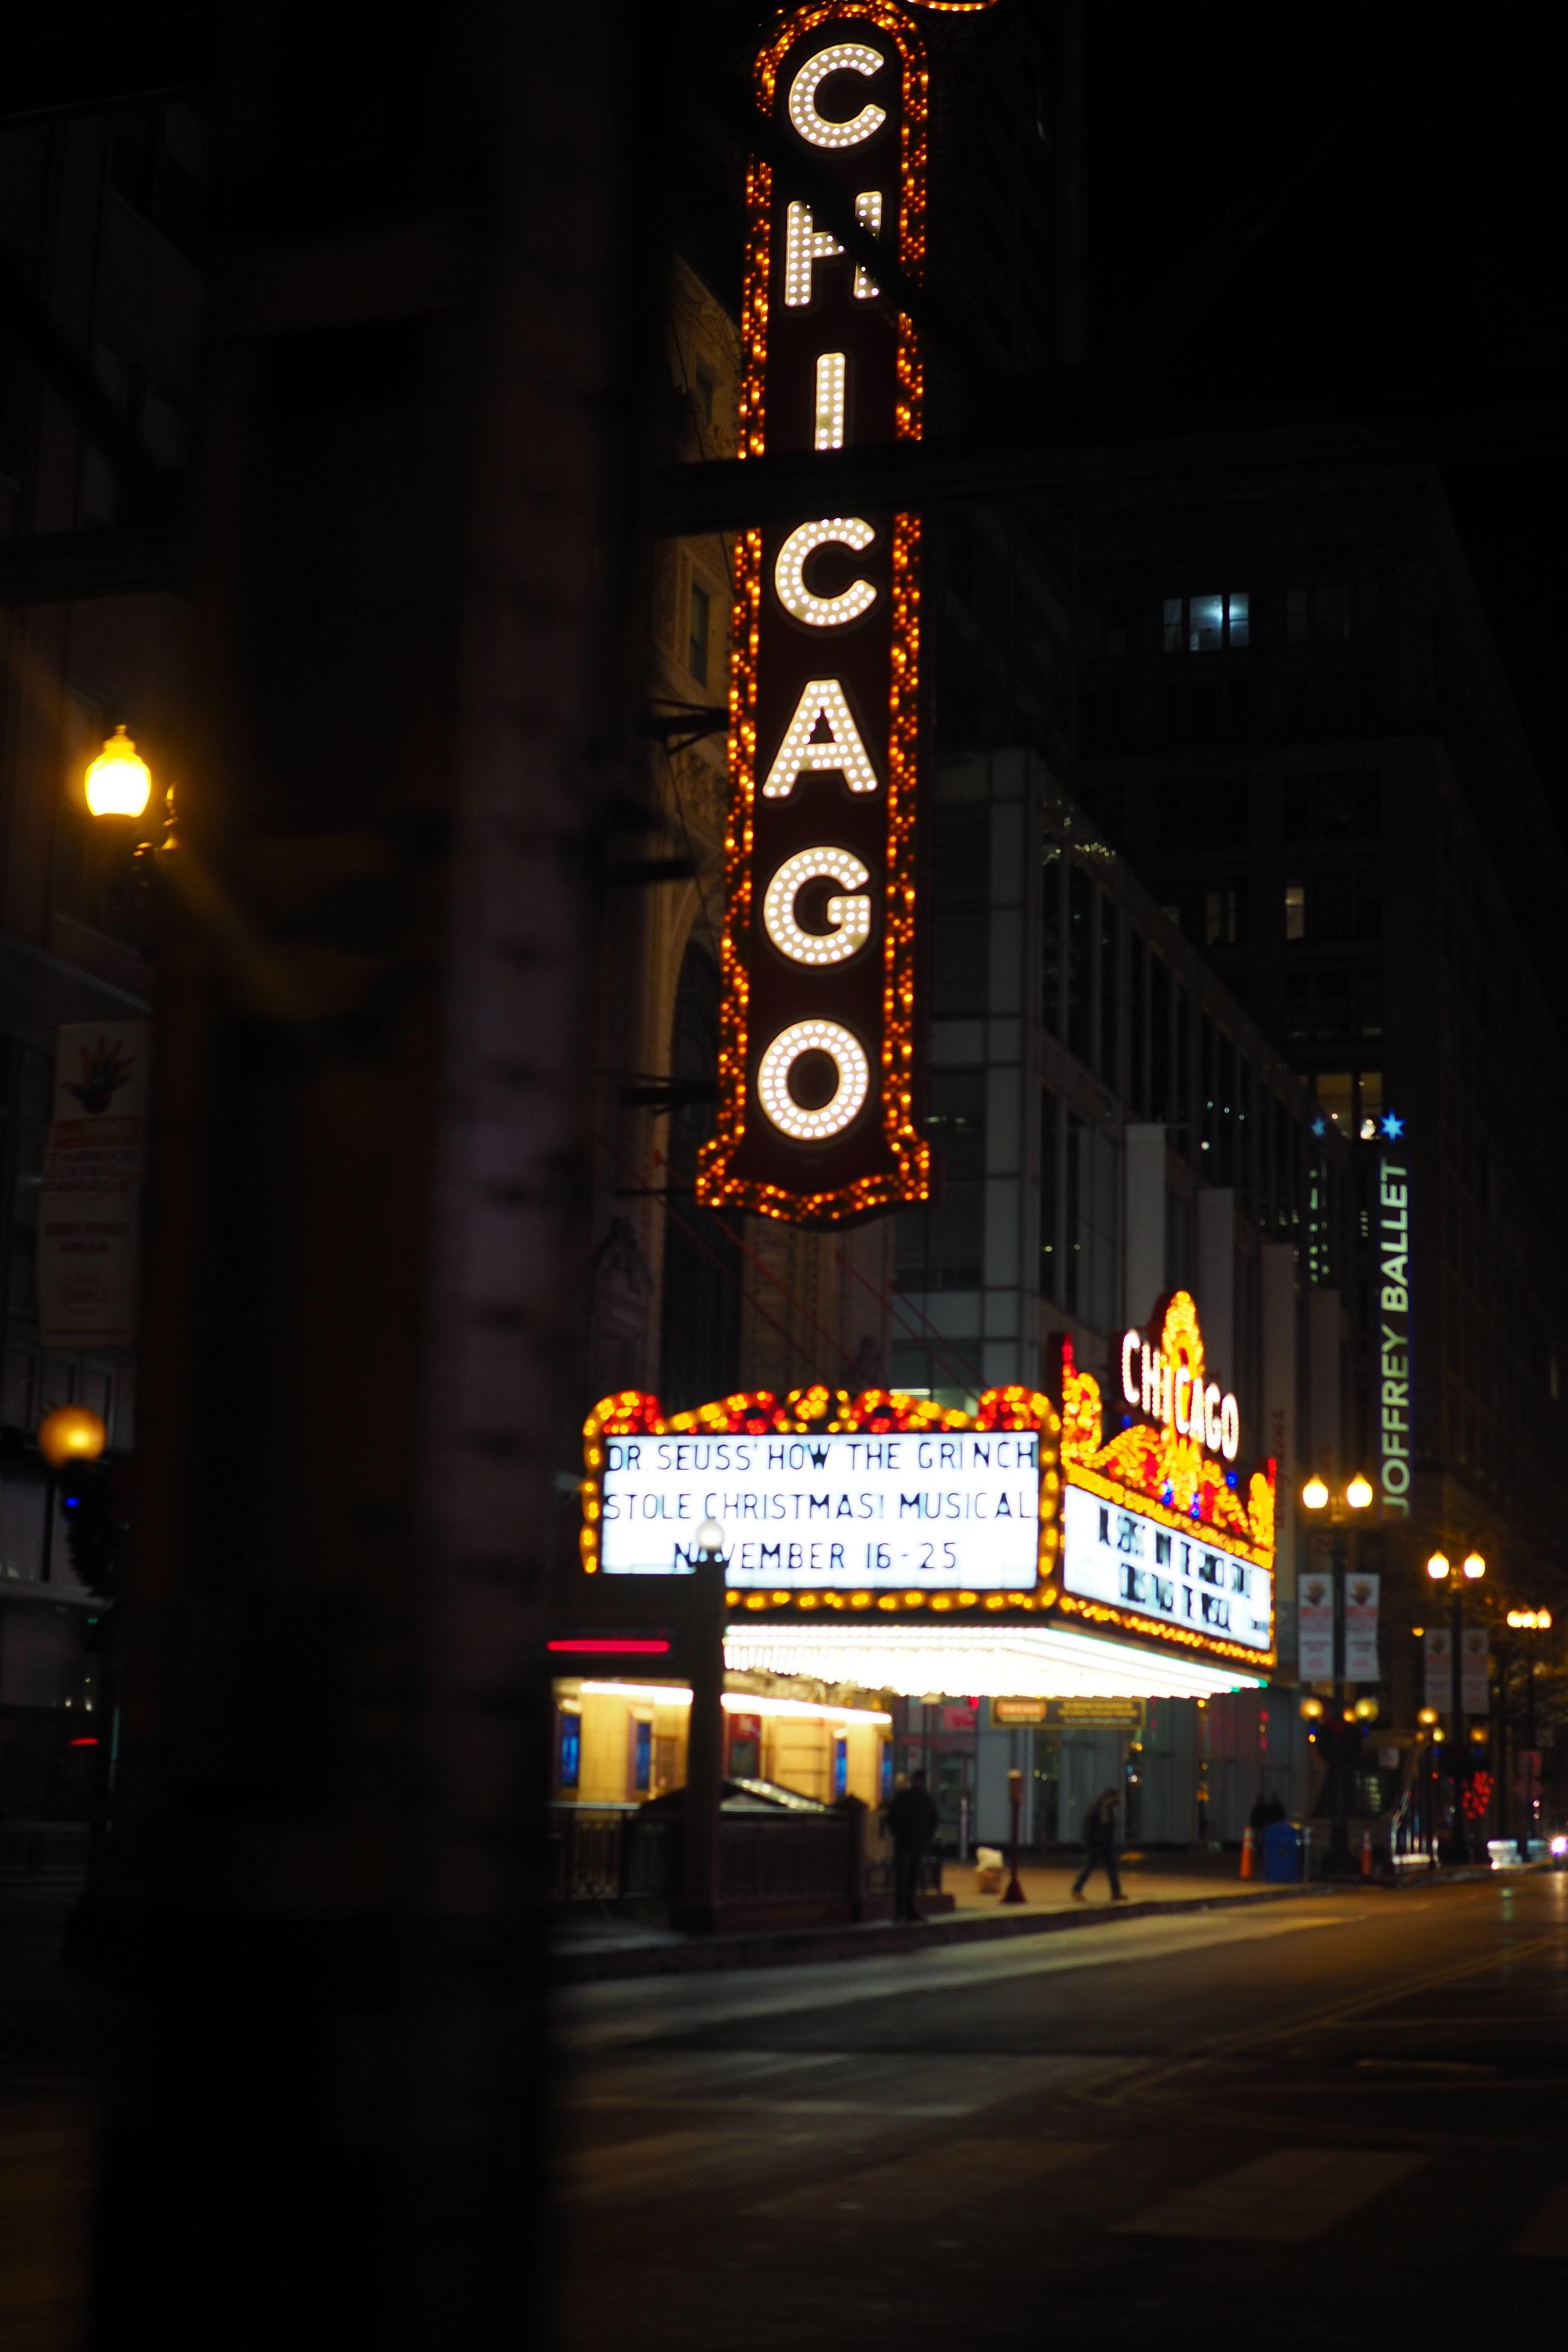 Broadway show anyone? Exploring Chicago at night…